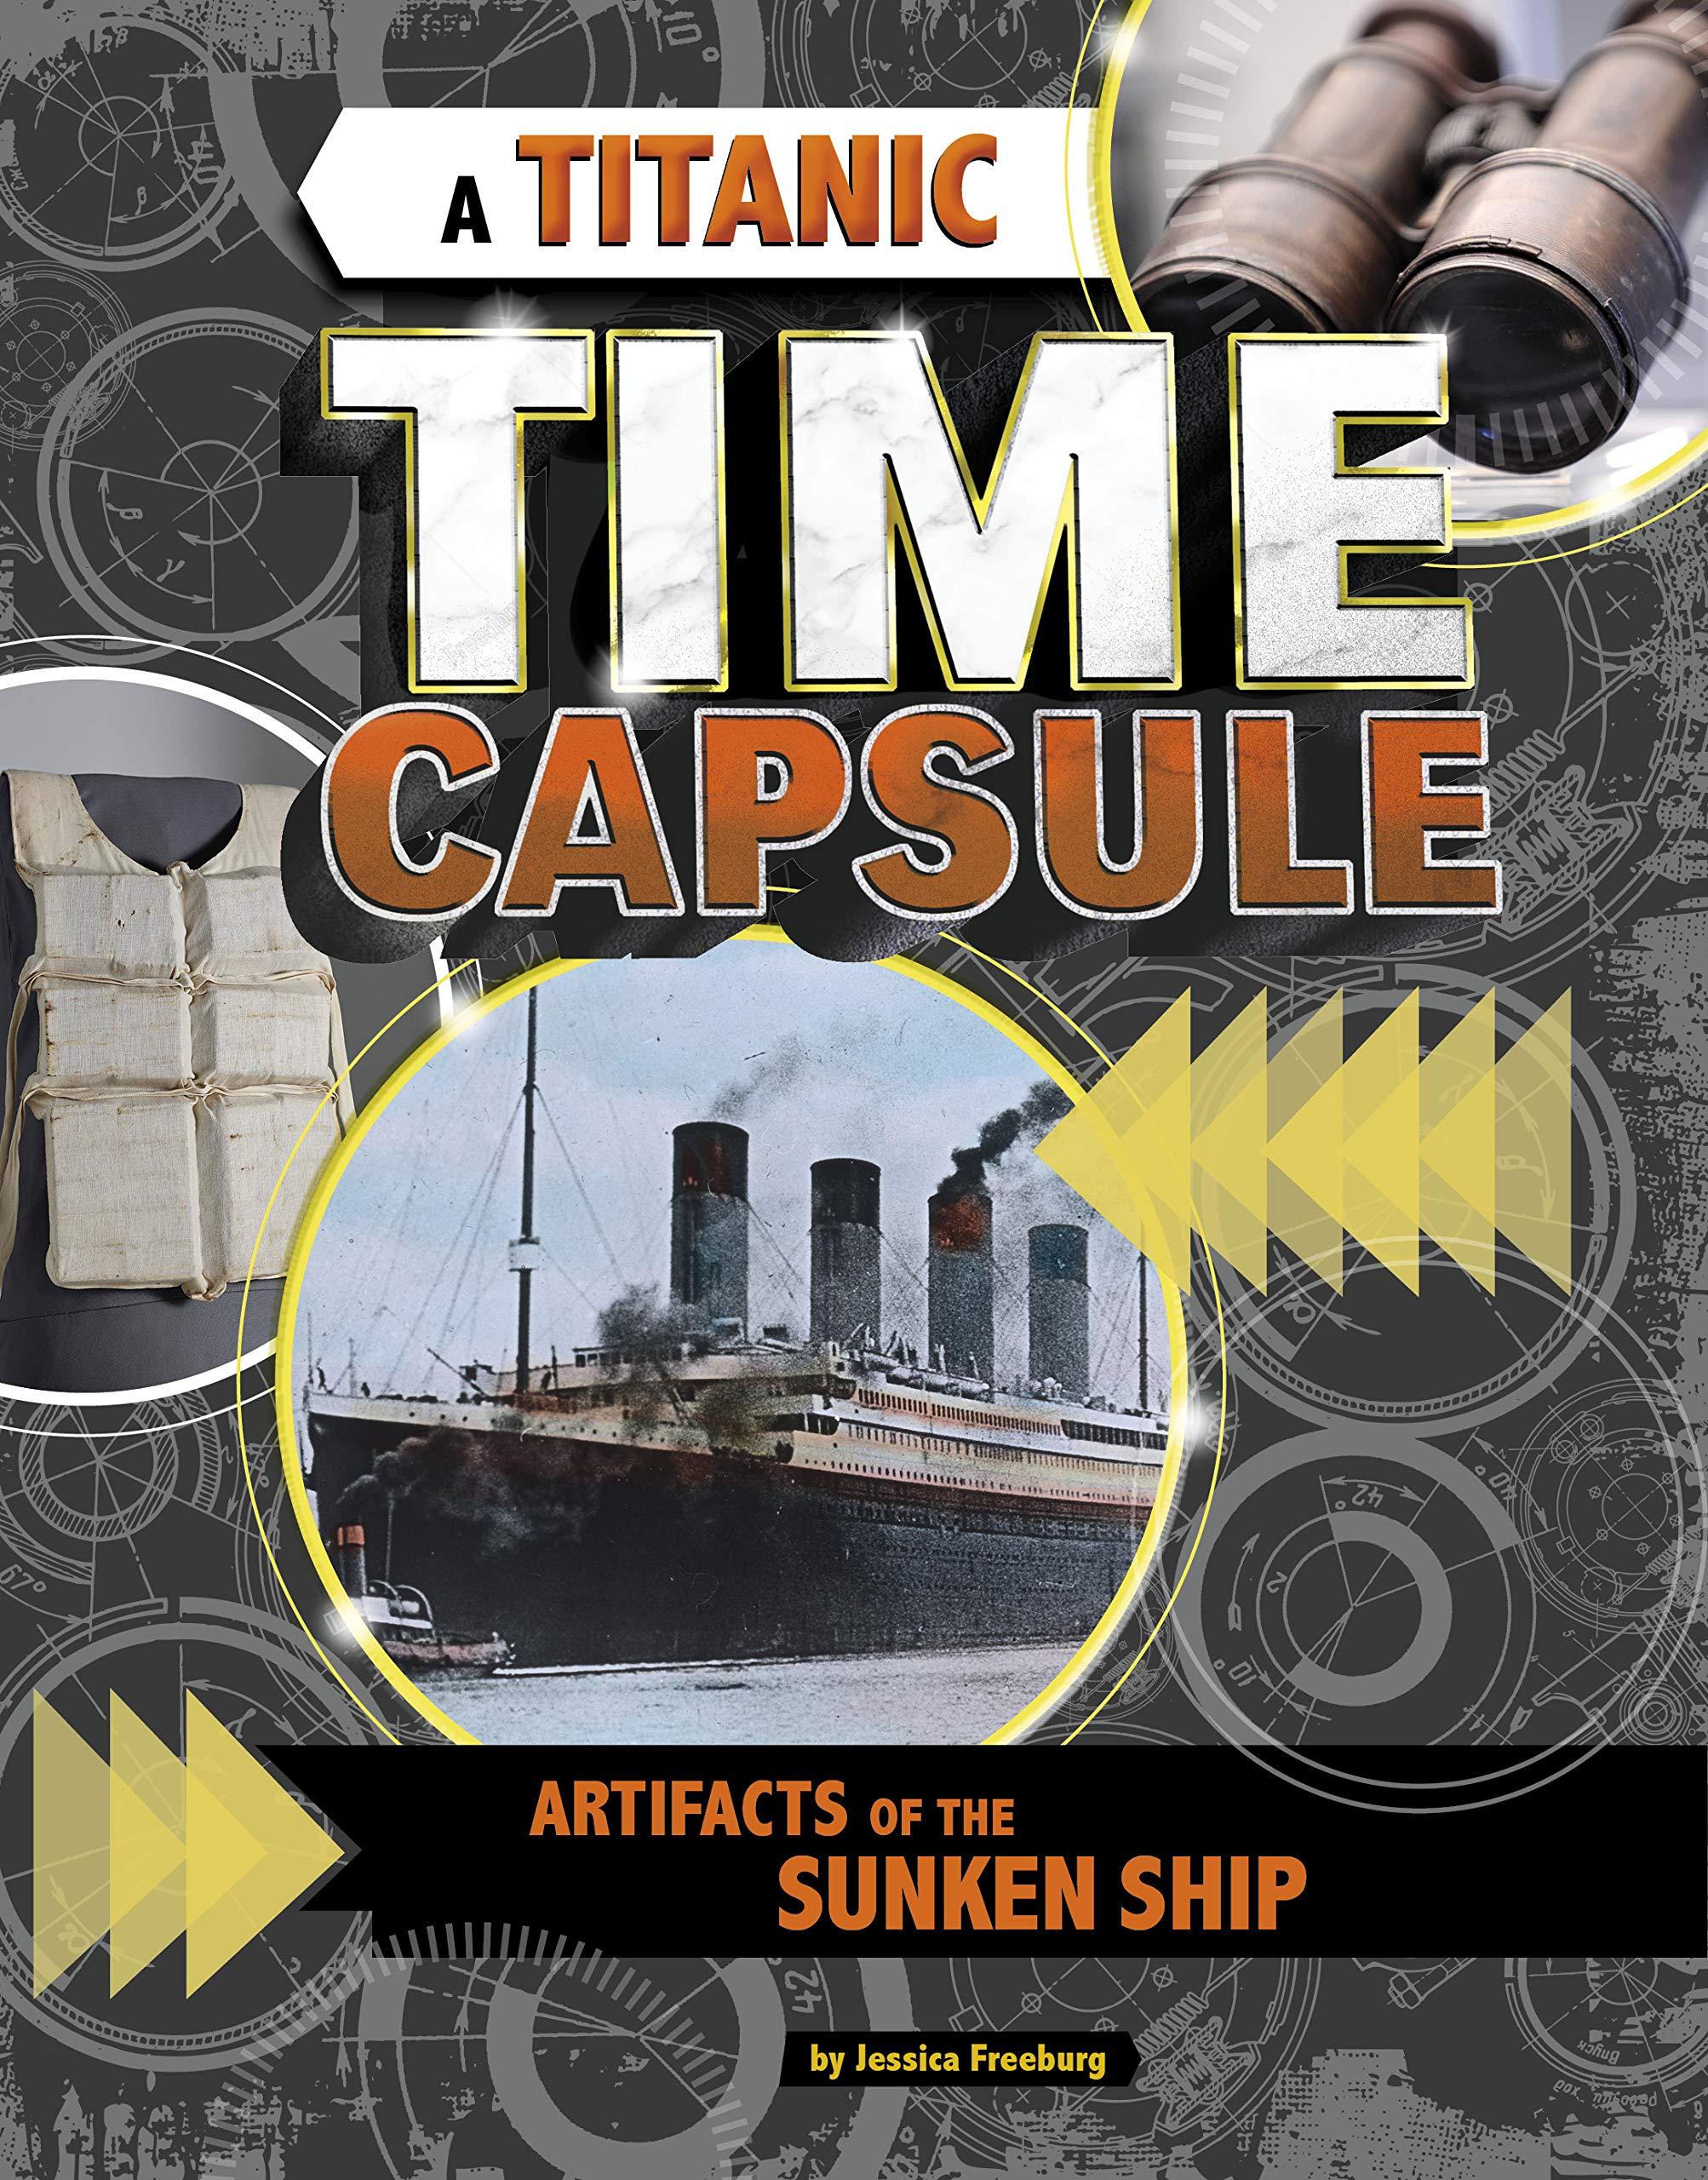 Capstone Press (August 1, 2020)